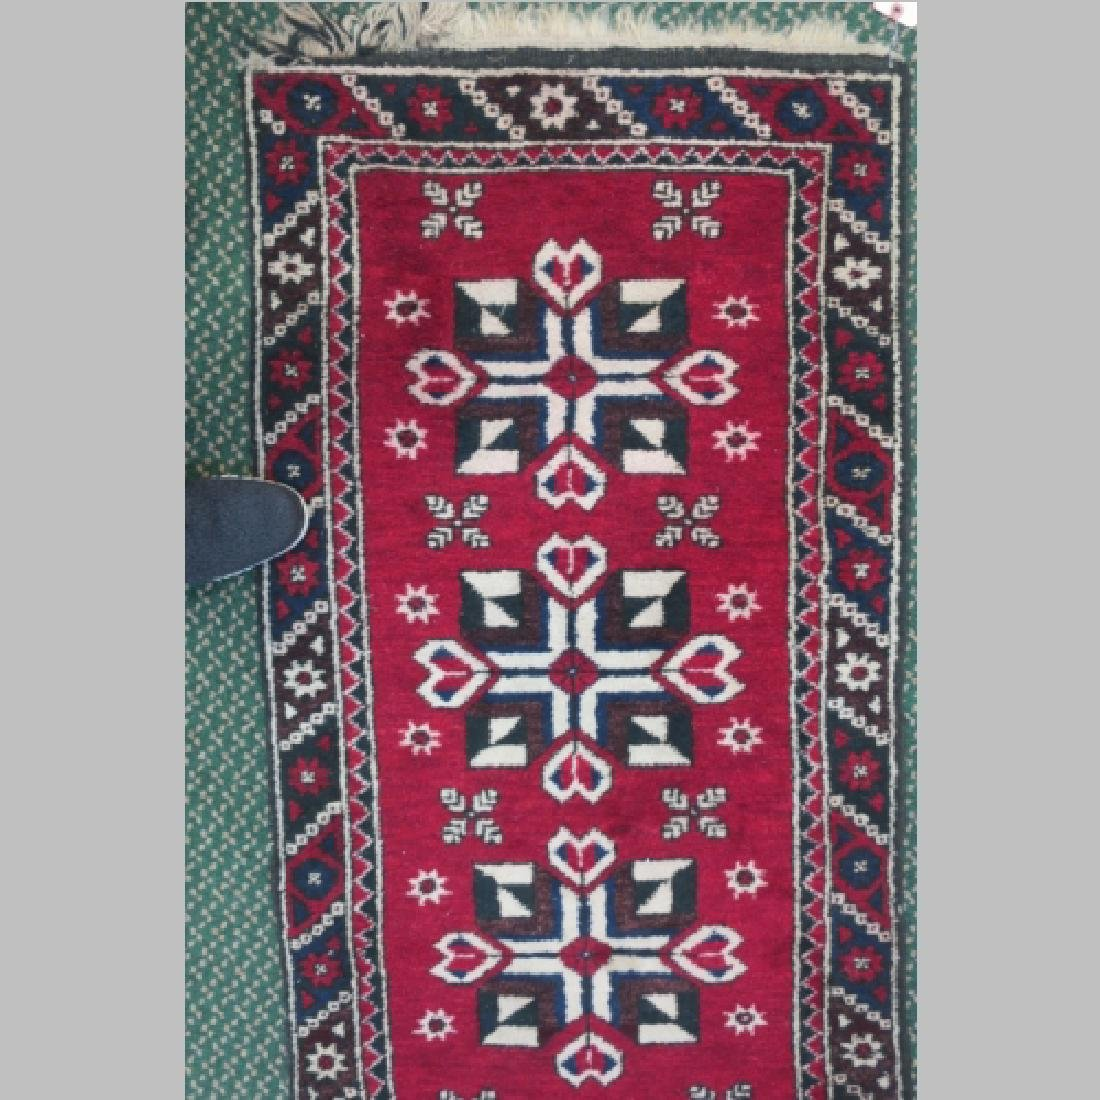 Handwoven Wool Iranian Area Rug: - 3